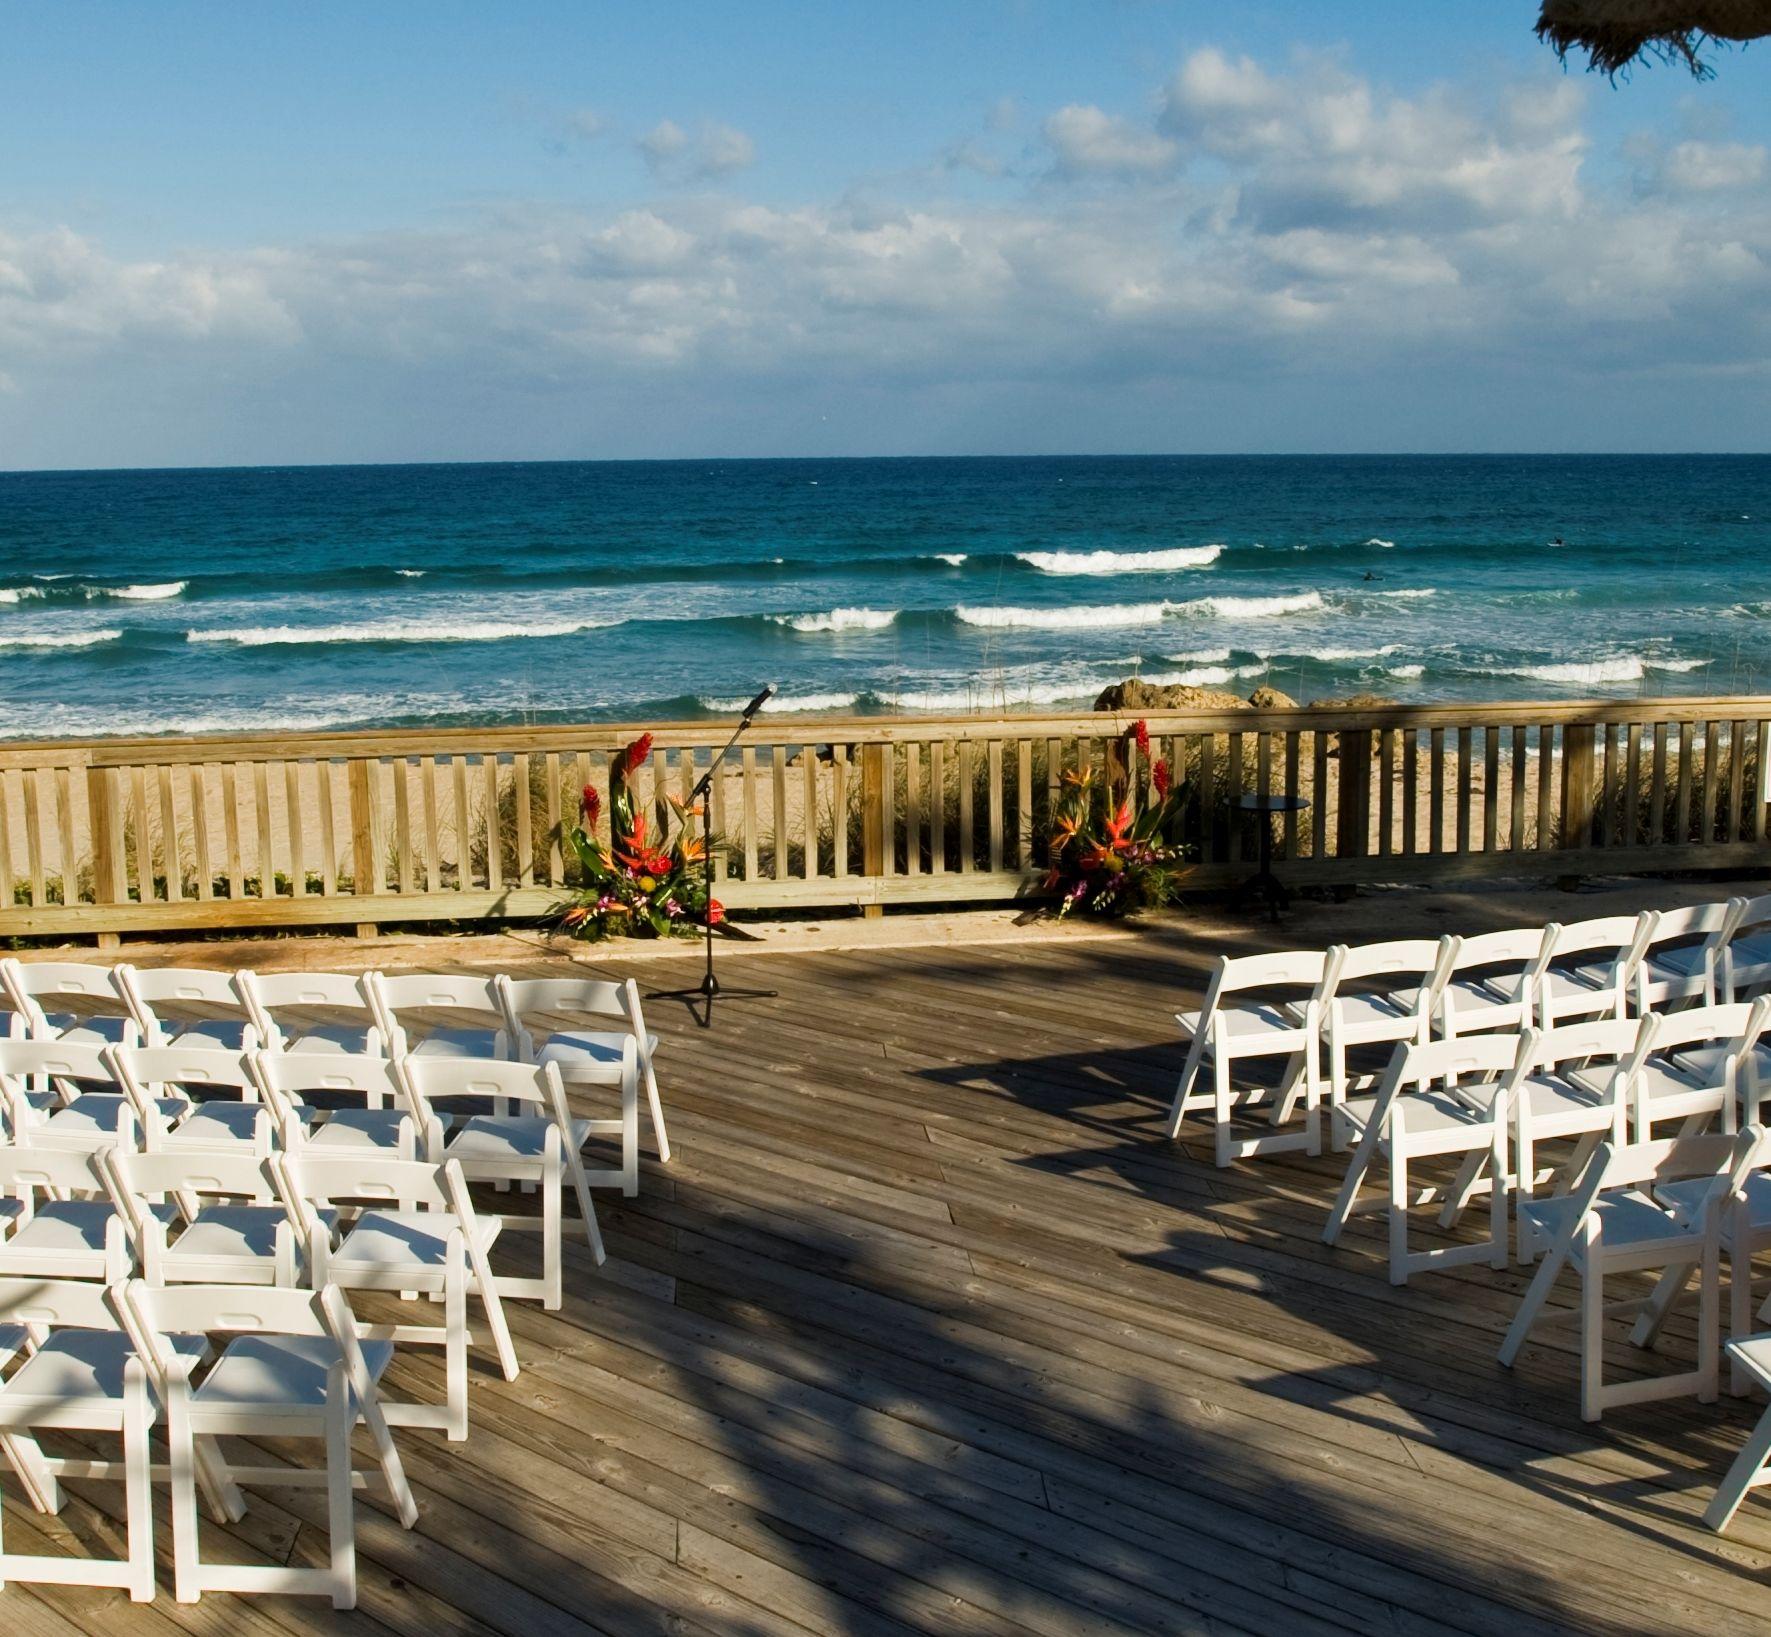 9th Street Boardwalk Wedding Ceremony Site, Deerfield Beach Florida ...